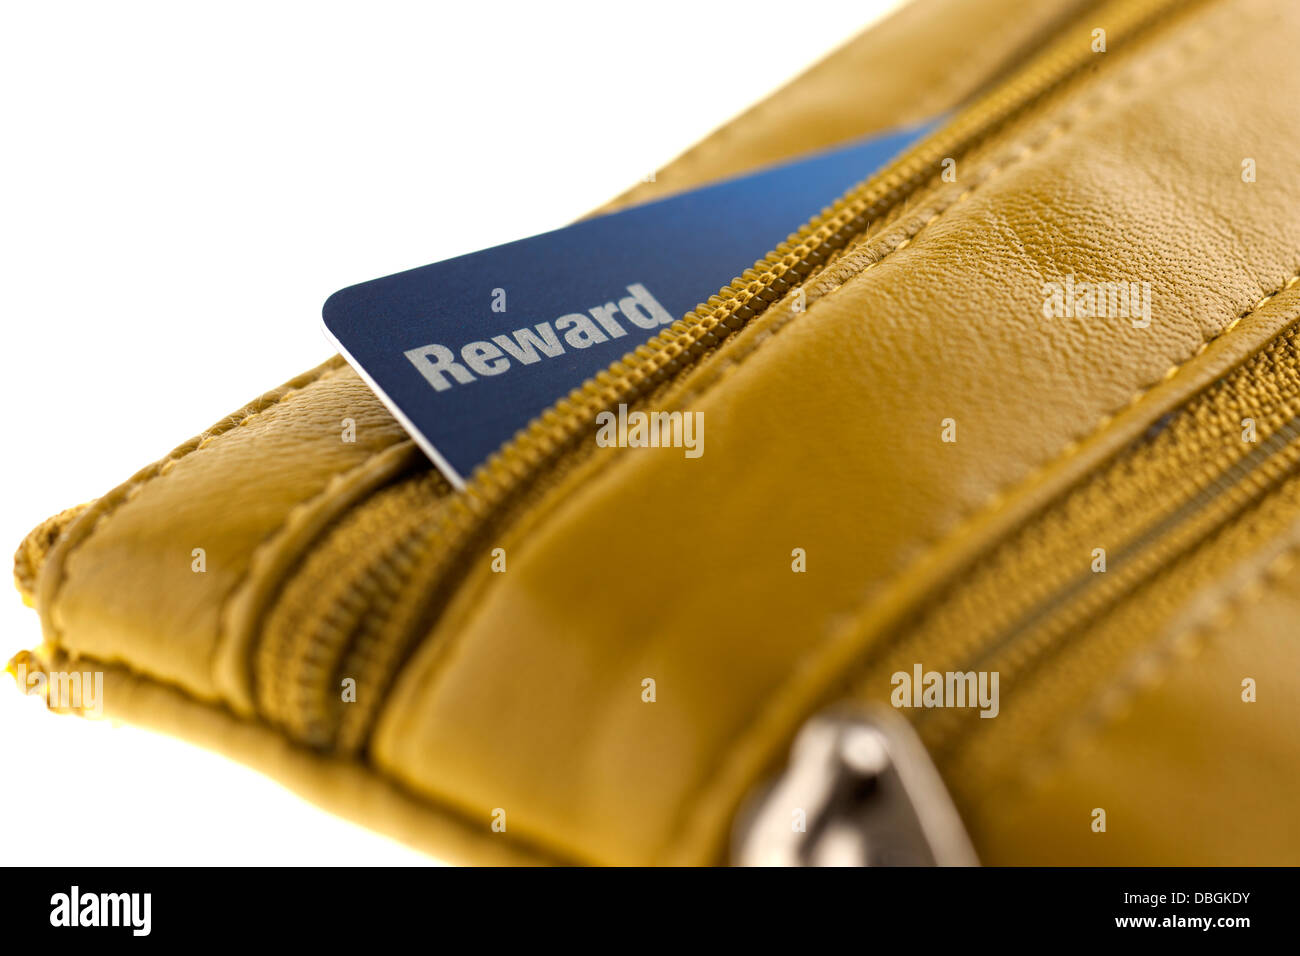 Reward card - Stock Image